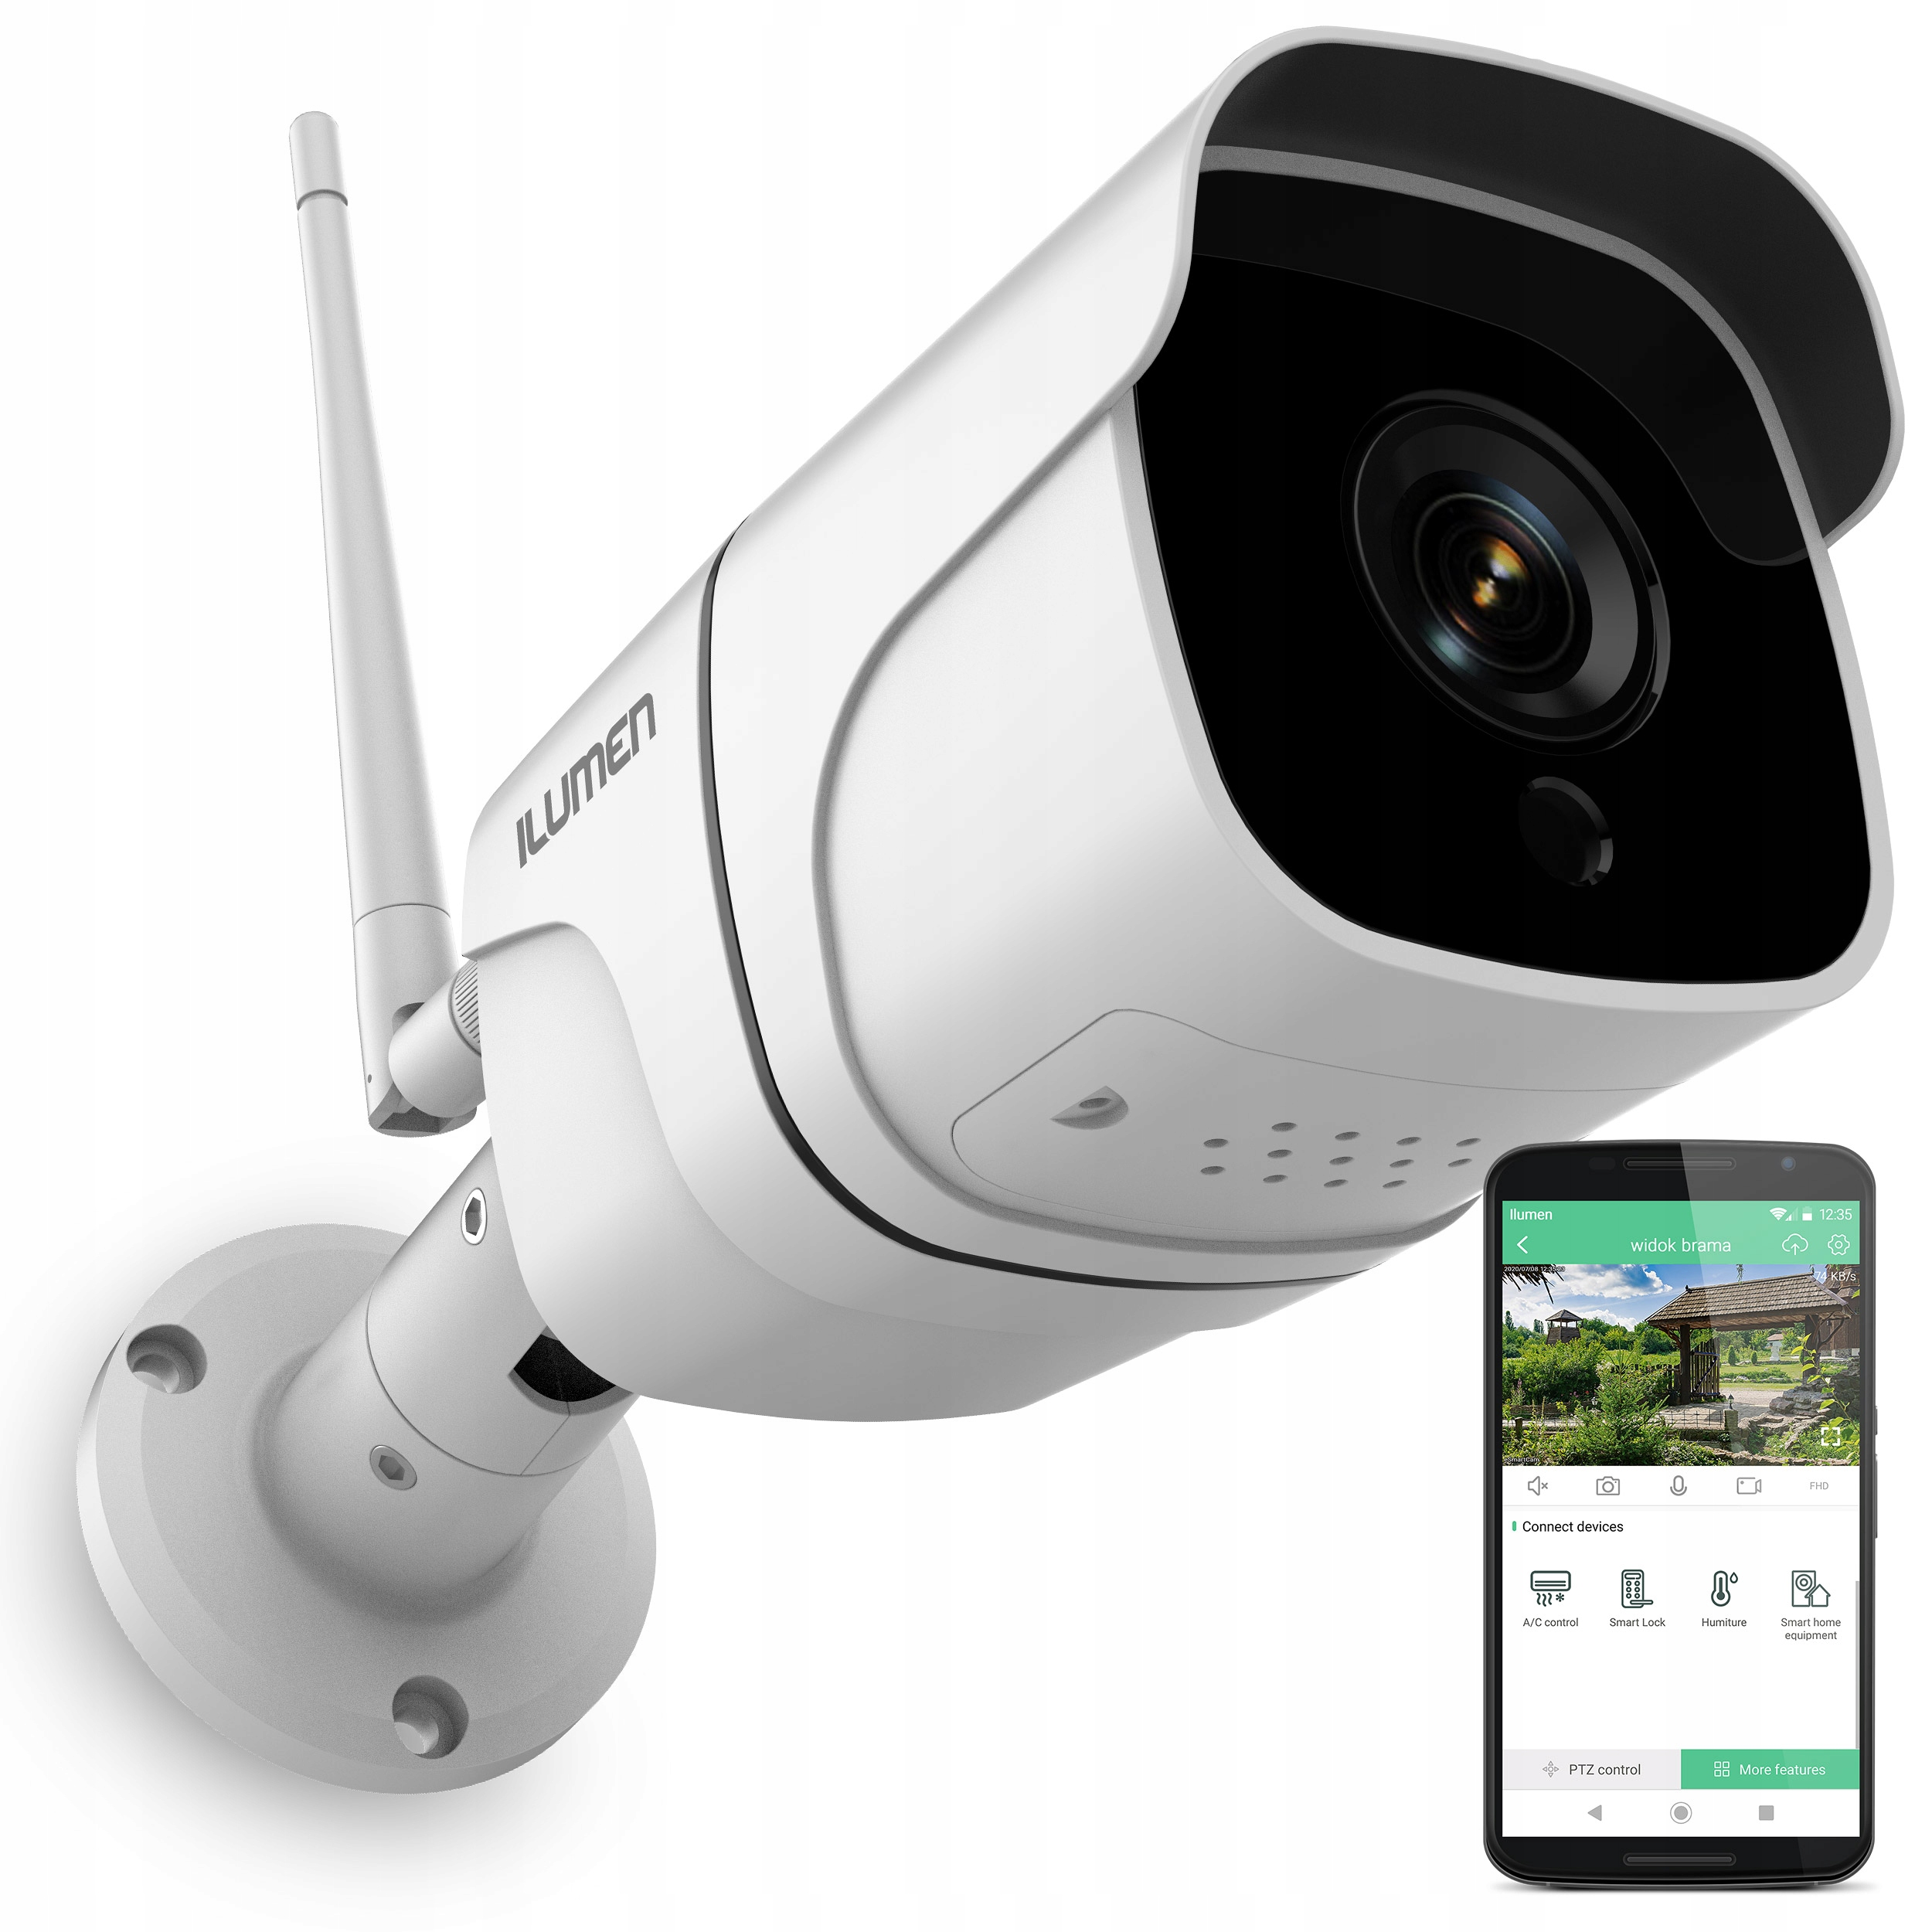 Kamera Zewnetrzna Wifi Noc Ip Full Hd 2mpx 1080p 8899910630 Sklep Internetowy Agd Rtv Telefony Laptopy Allegro Pl